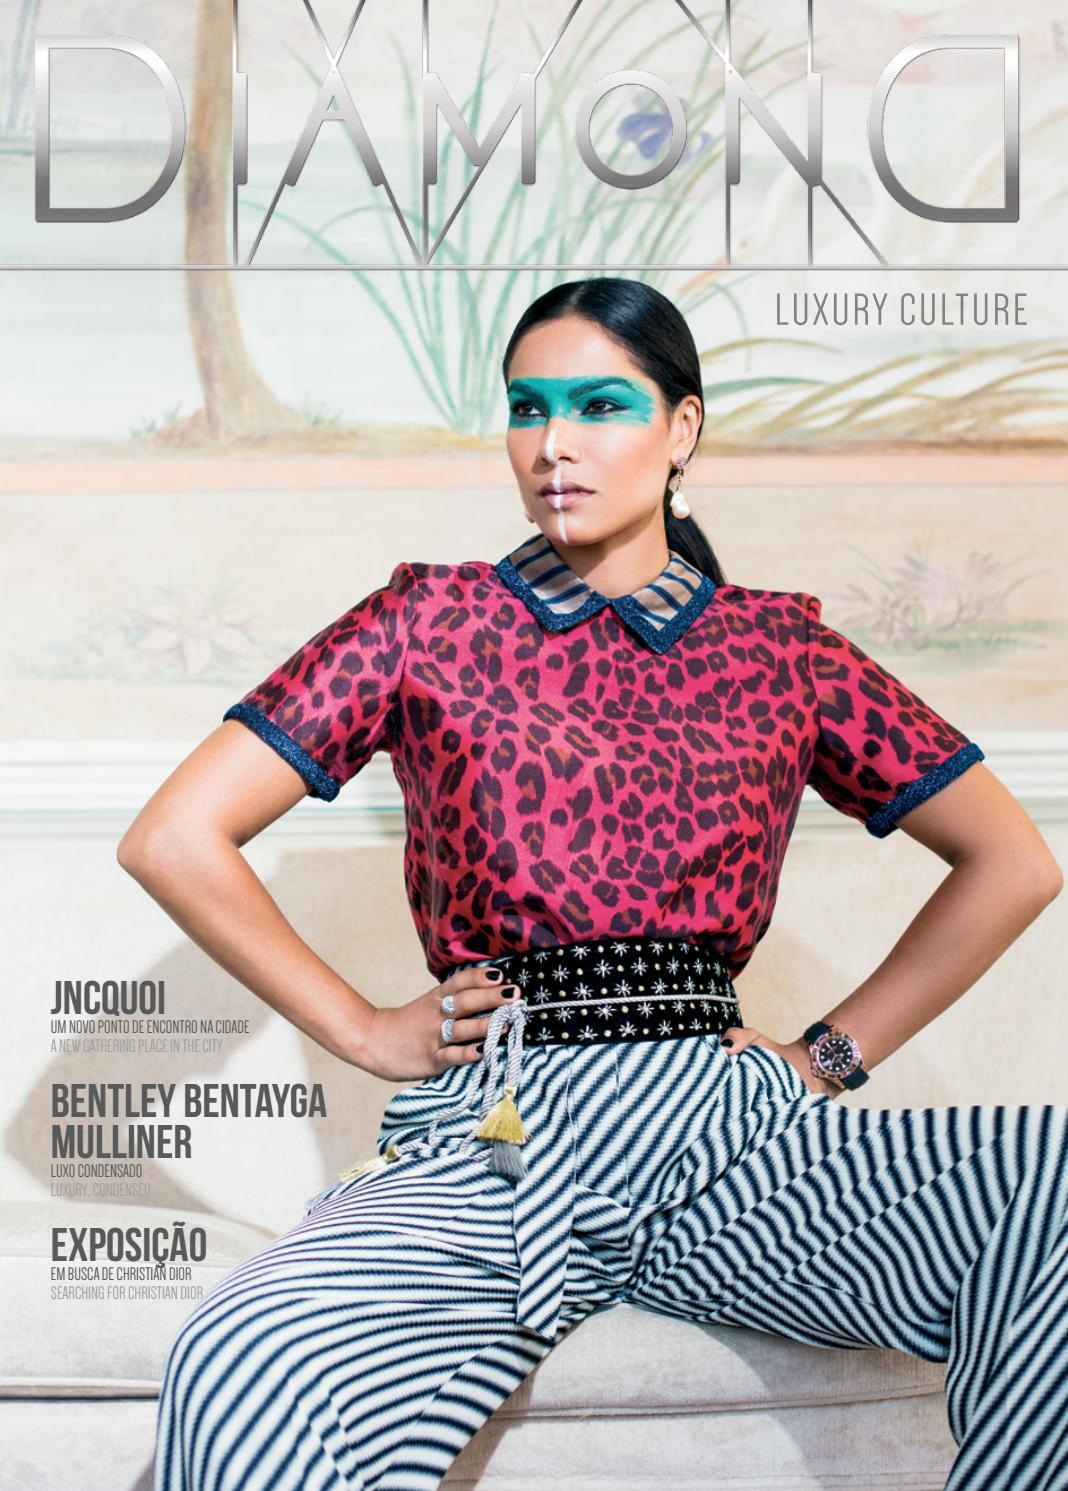 2c190852823 DIAMOND Luxury Culture Magazine  12 by DIAMOND Luxury Culture Magazine -  issuu